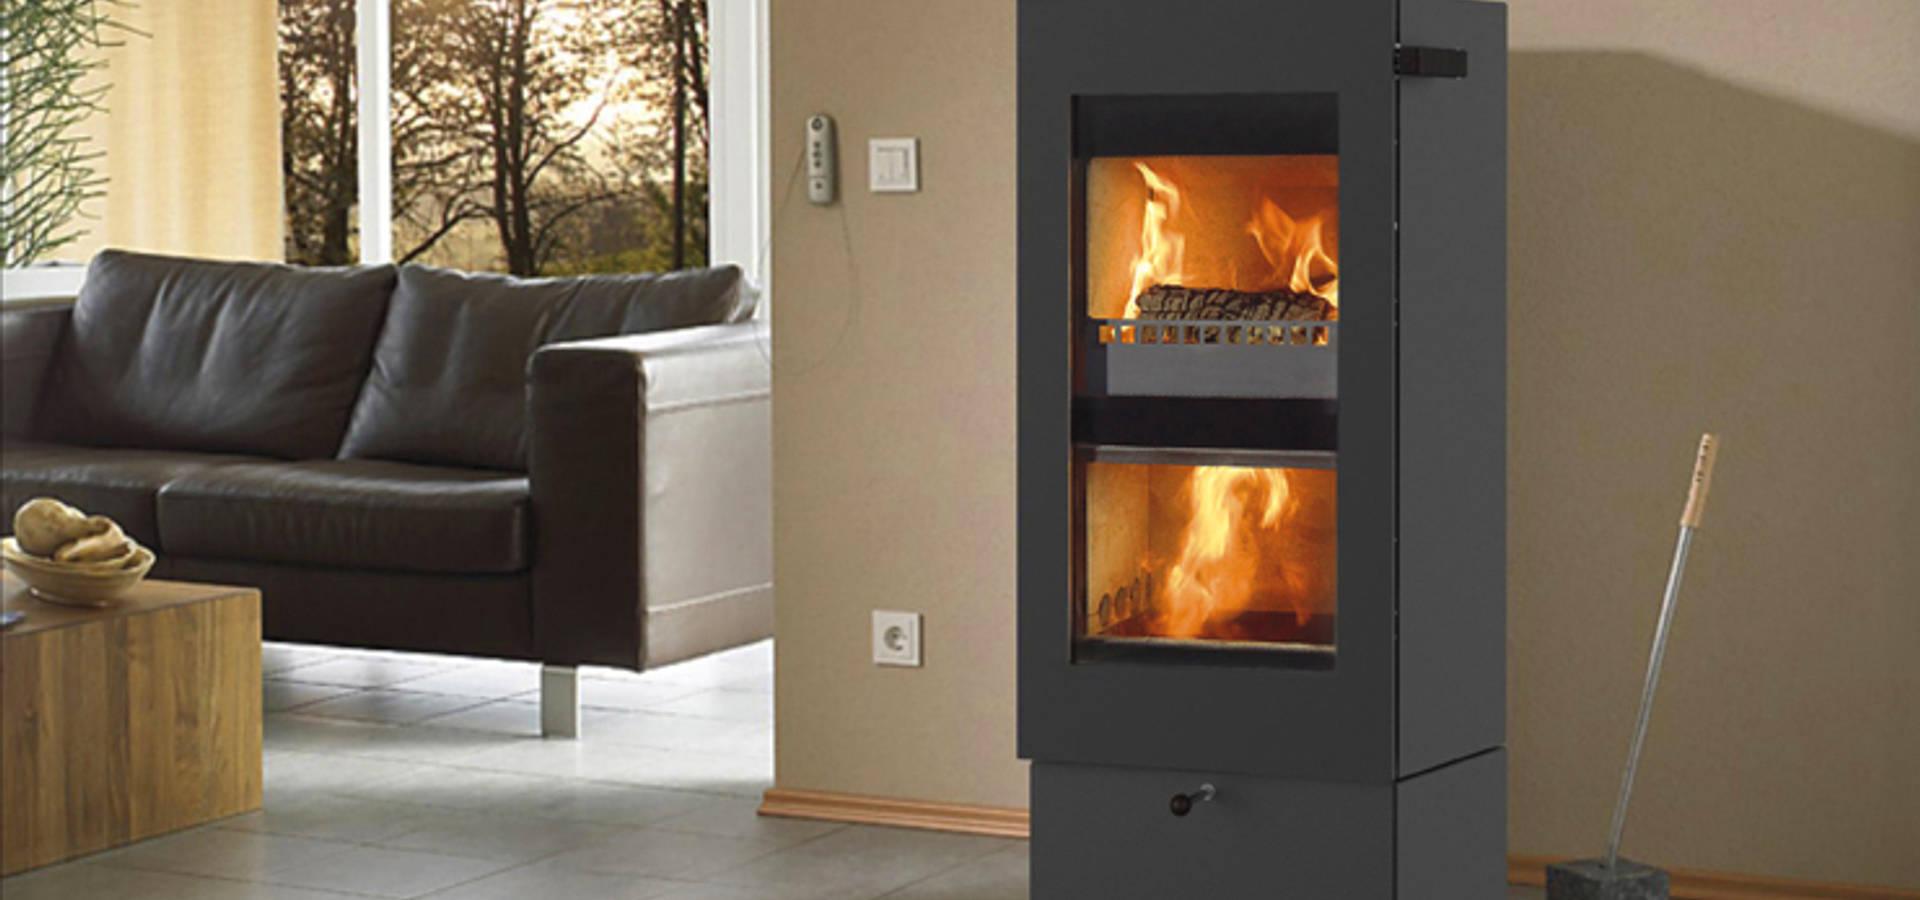 xeoos kaminofen twinfire von kaminstudio francois homify. Black Bedroom Furniture Sets. Home Design Ideas